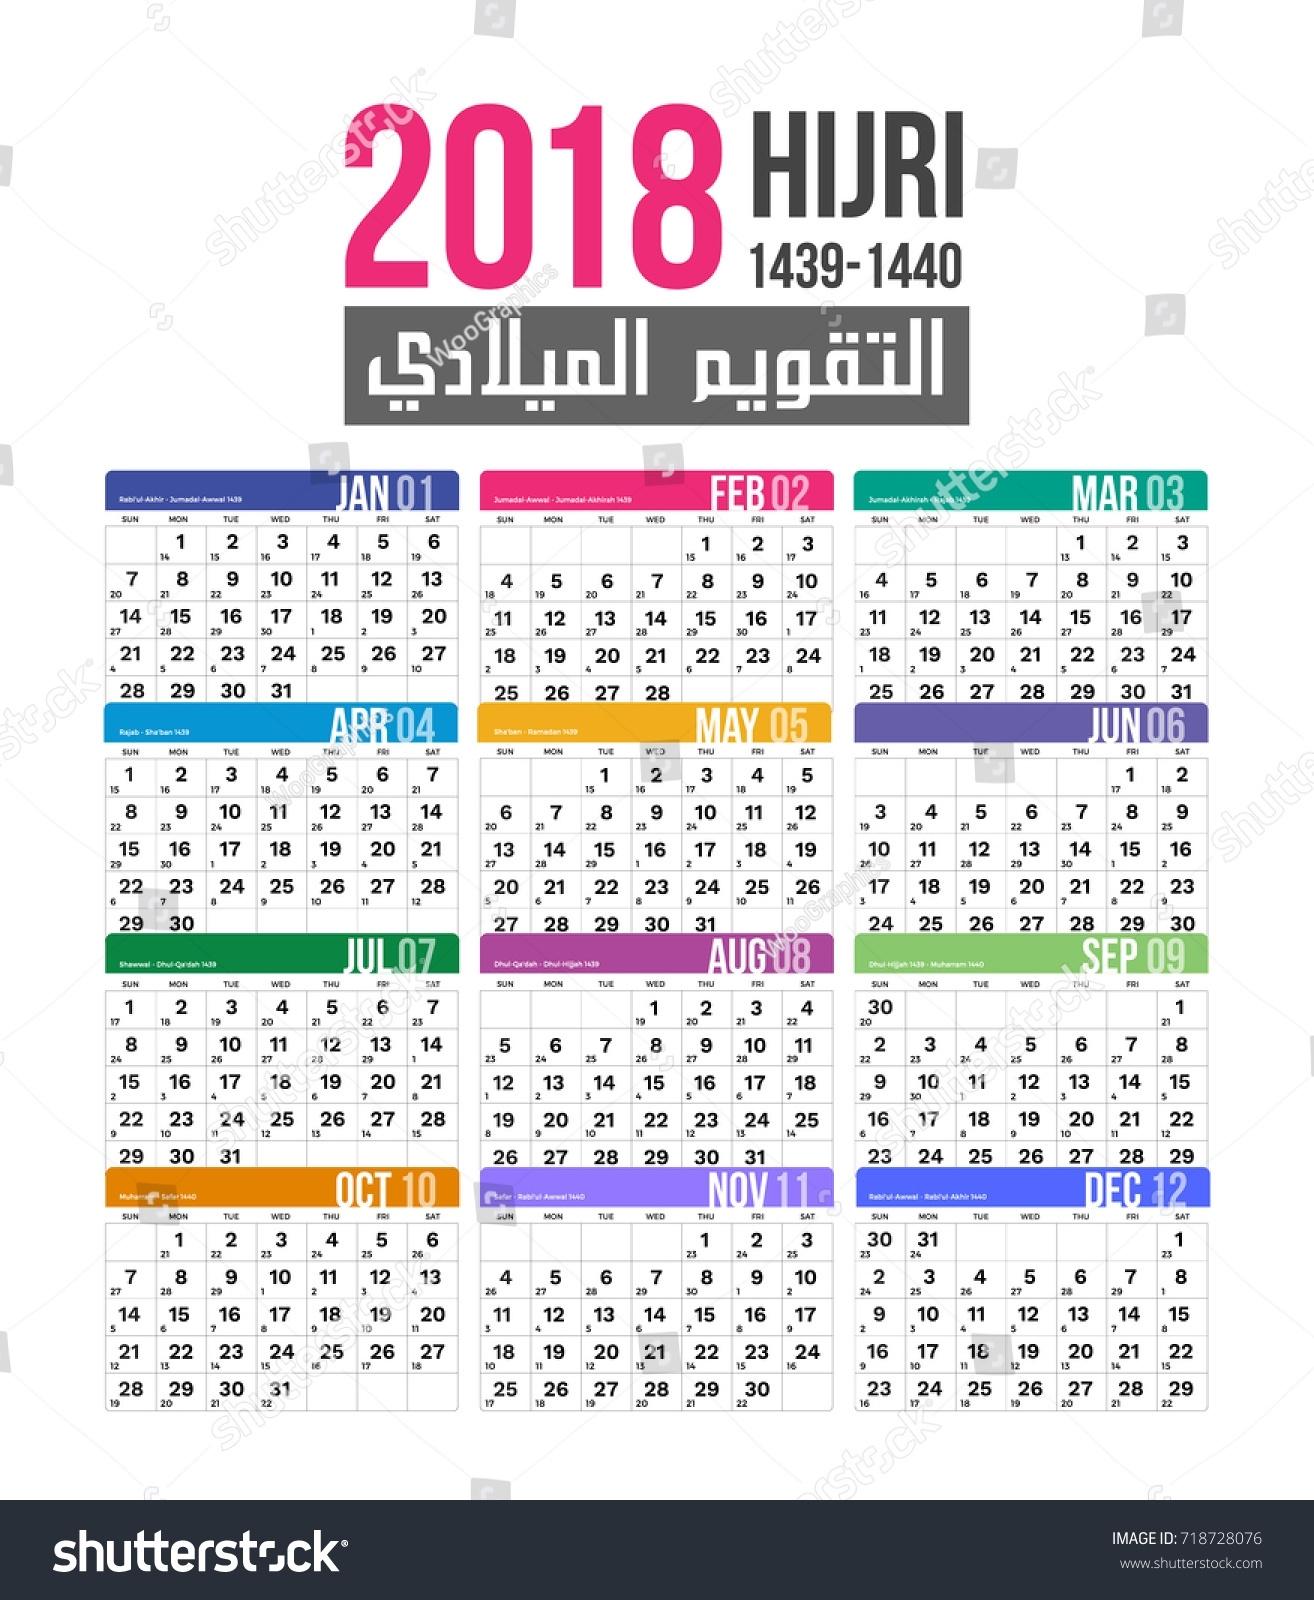 Hijri Calendar 2019 | 2018 Yearly Calendar for Hijri Calendar 1438 With Gregorian Calendar